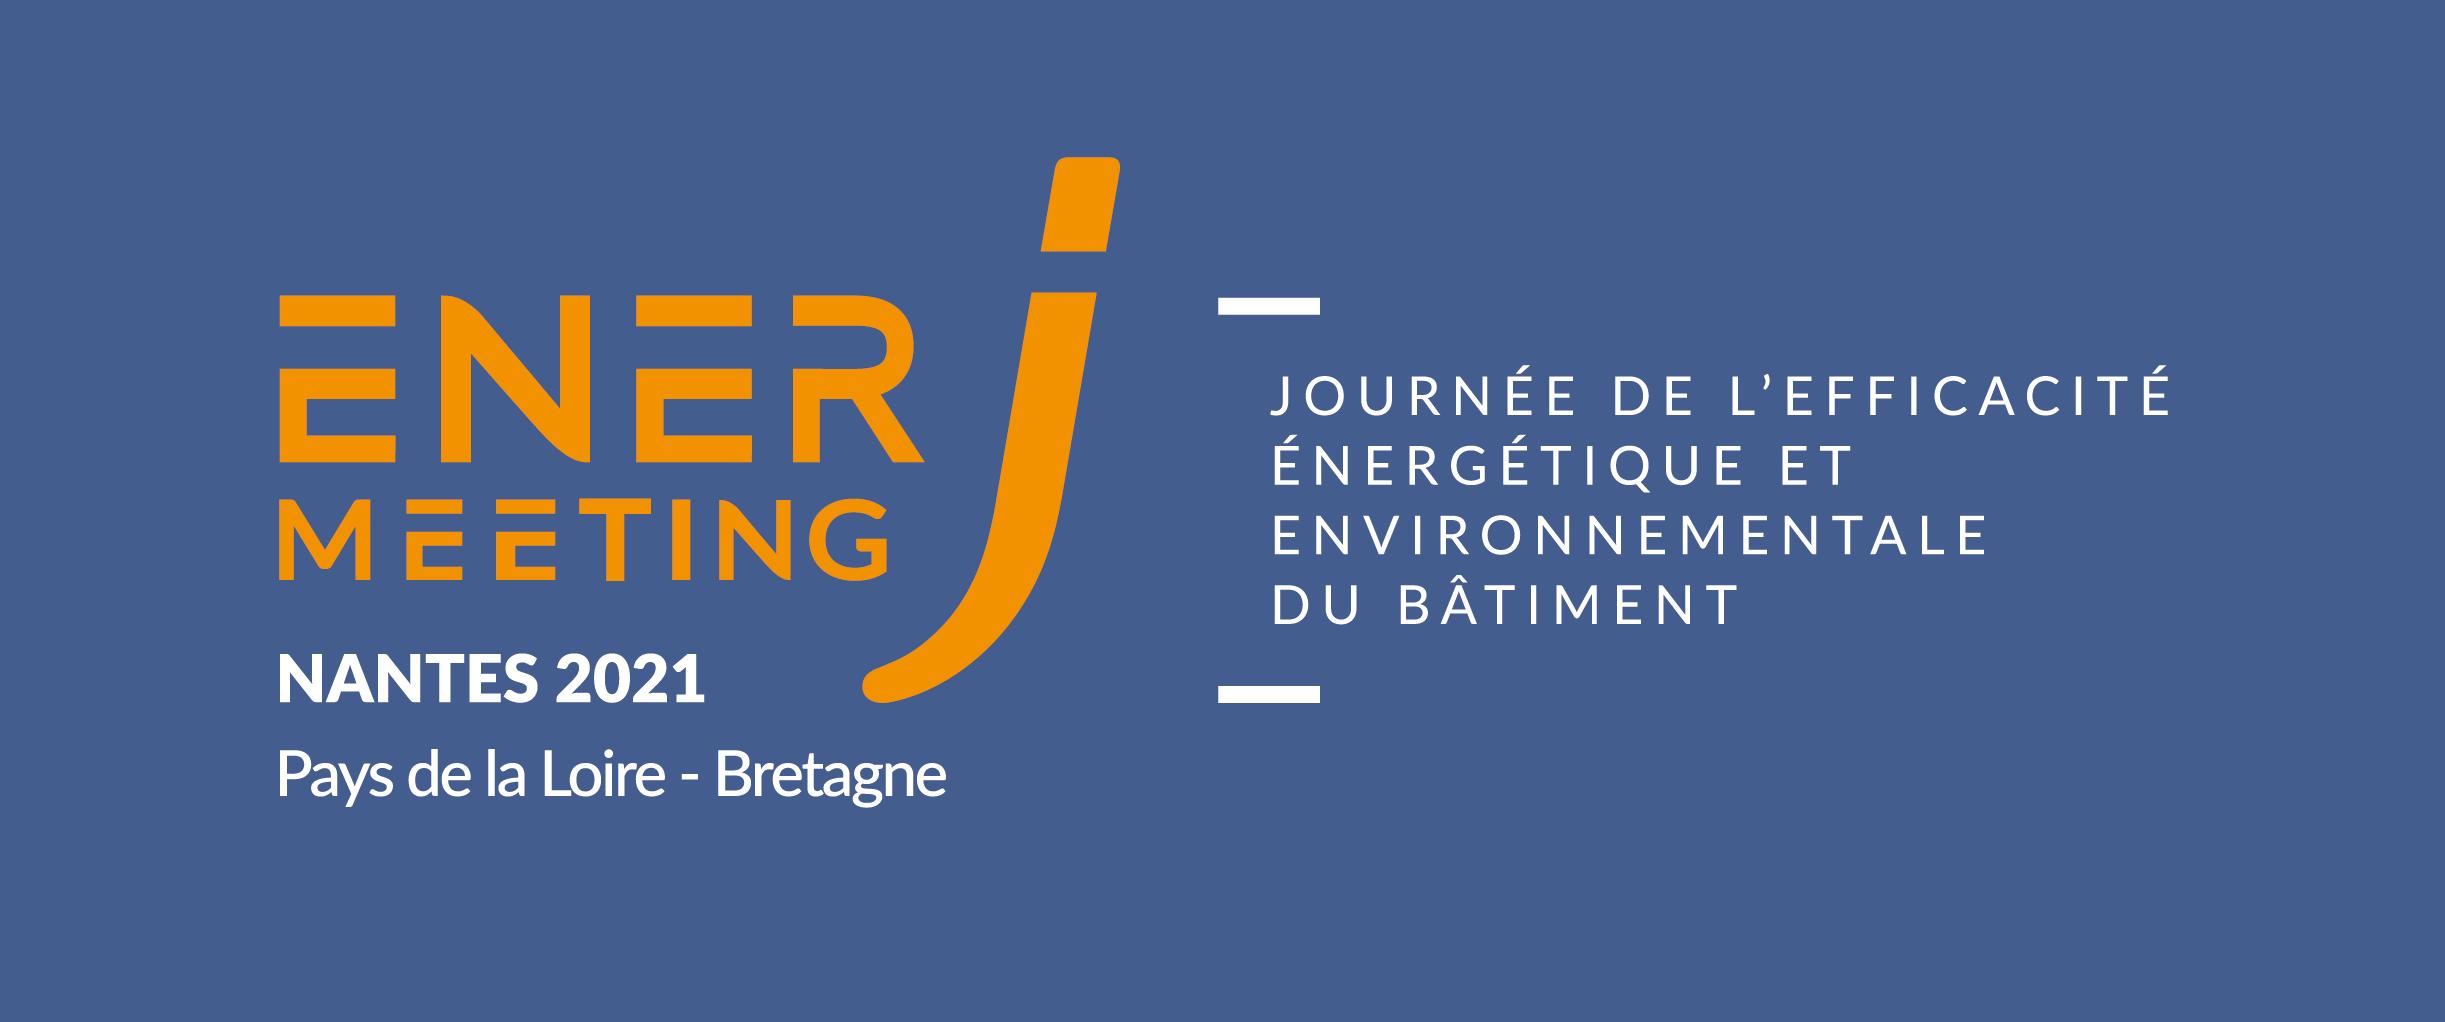 EnerJ-meeting Nantes - 28 septembre 2021